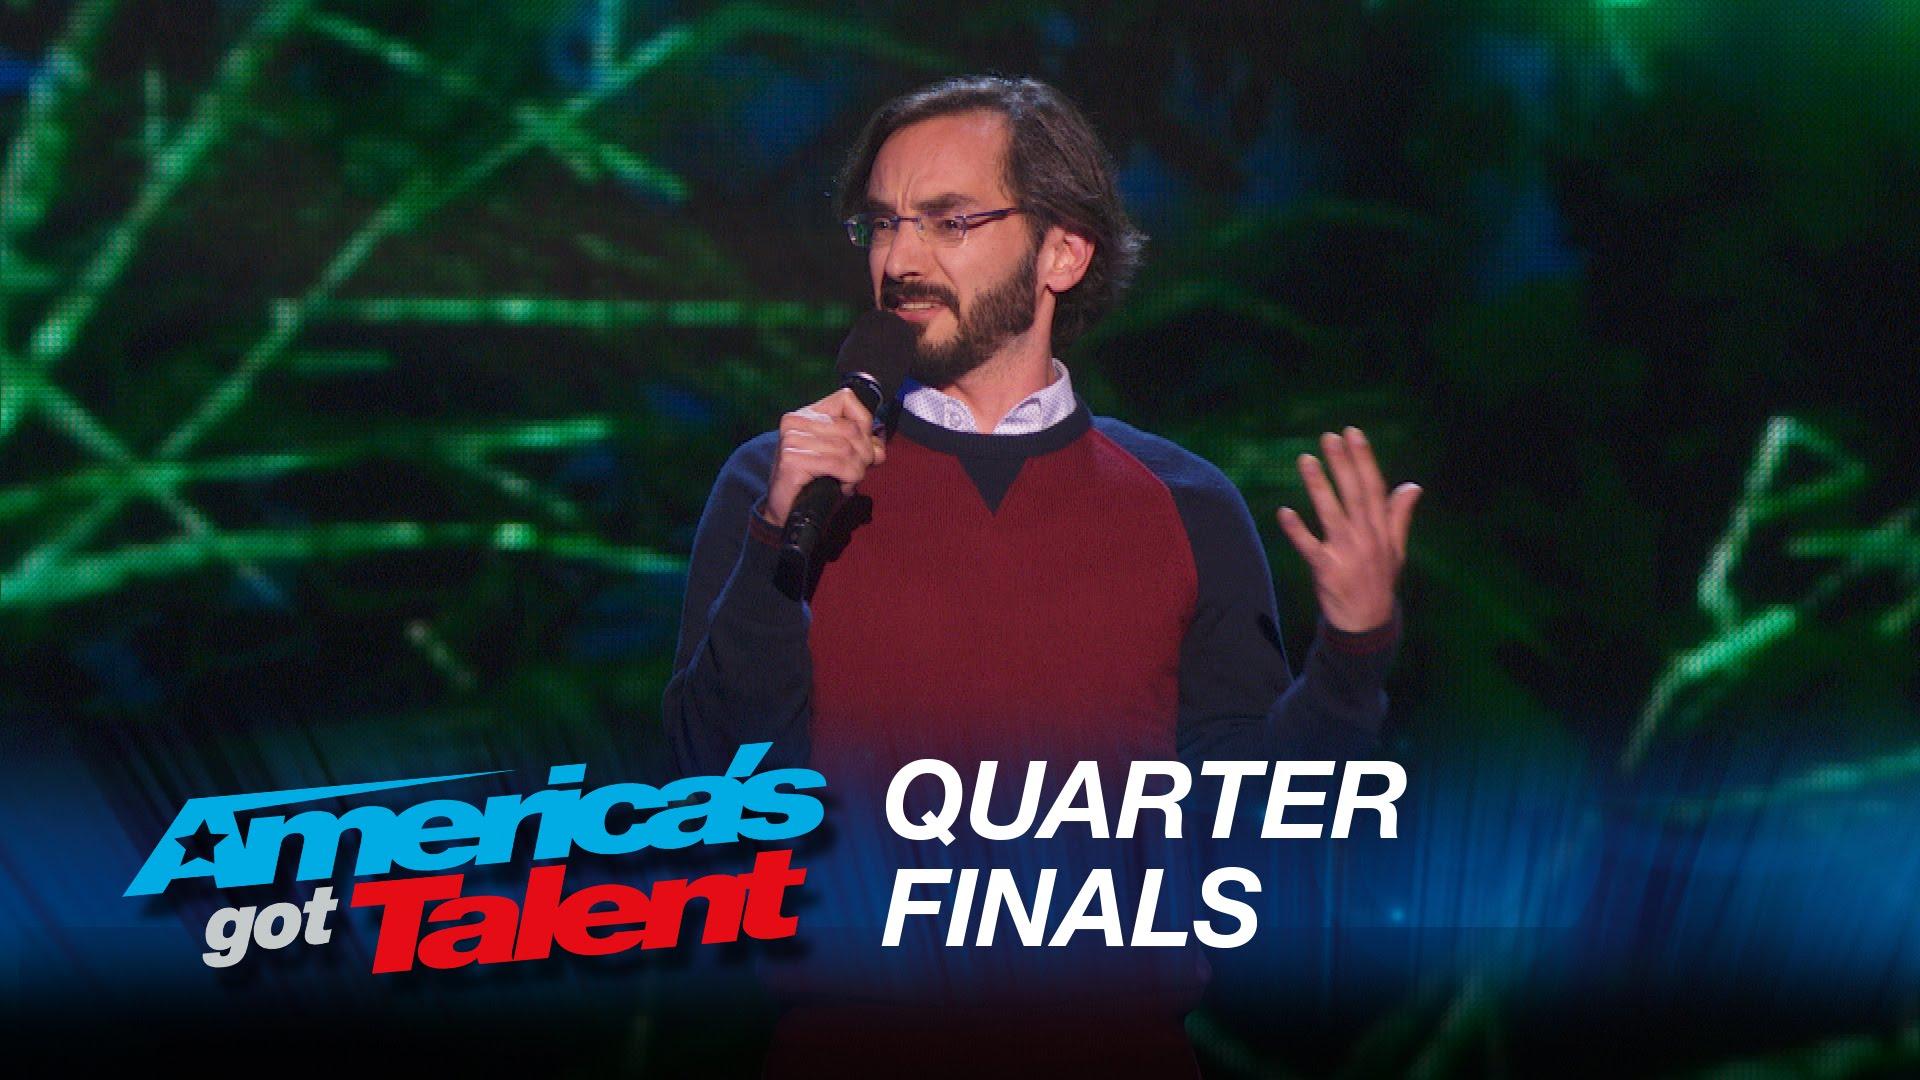 Myq Kaplan's live quarterfinal round of America's Got Talent at Radio City Music Hall